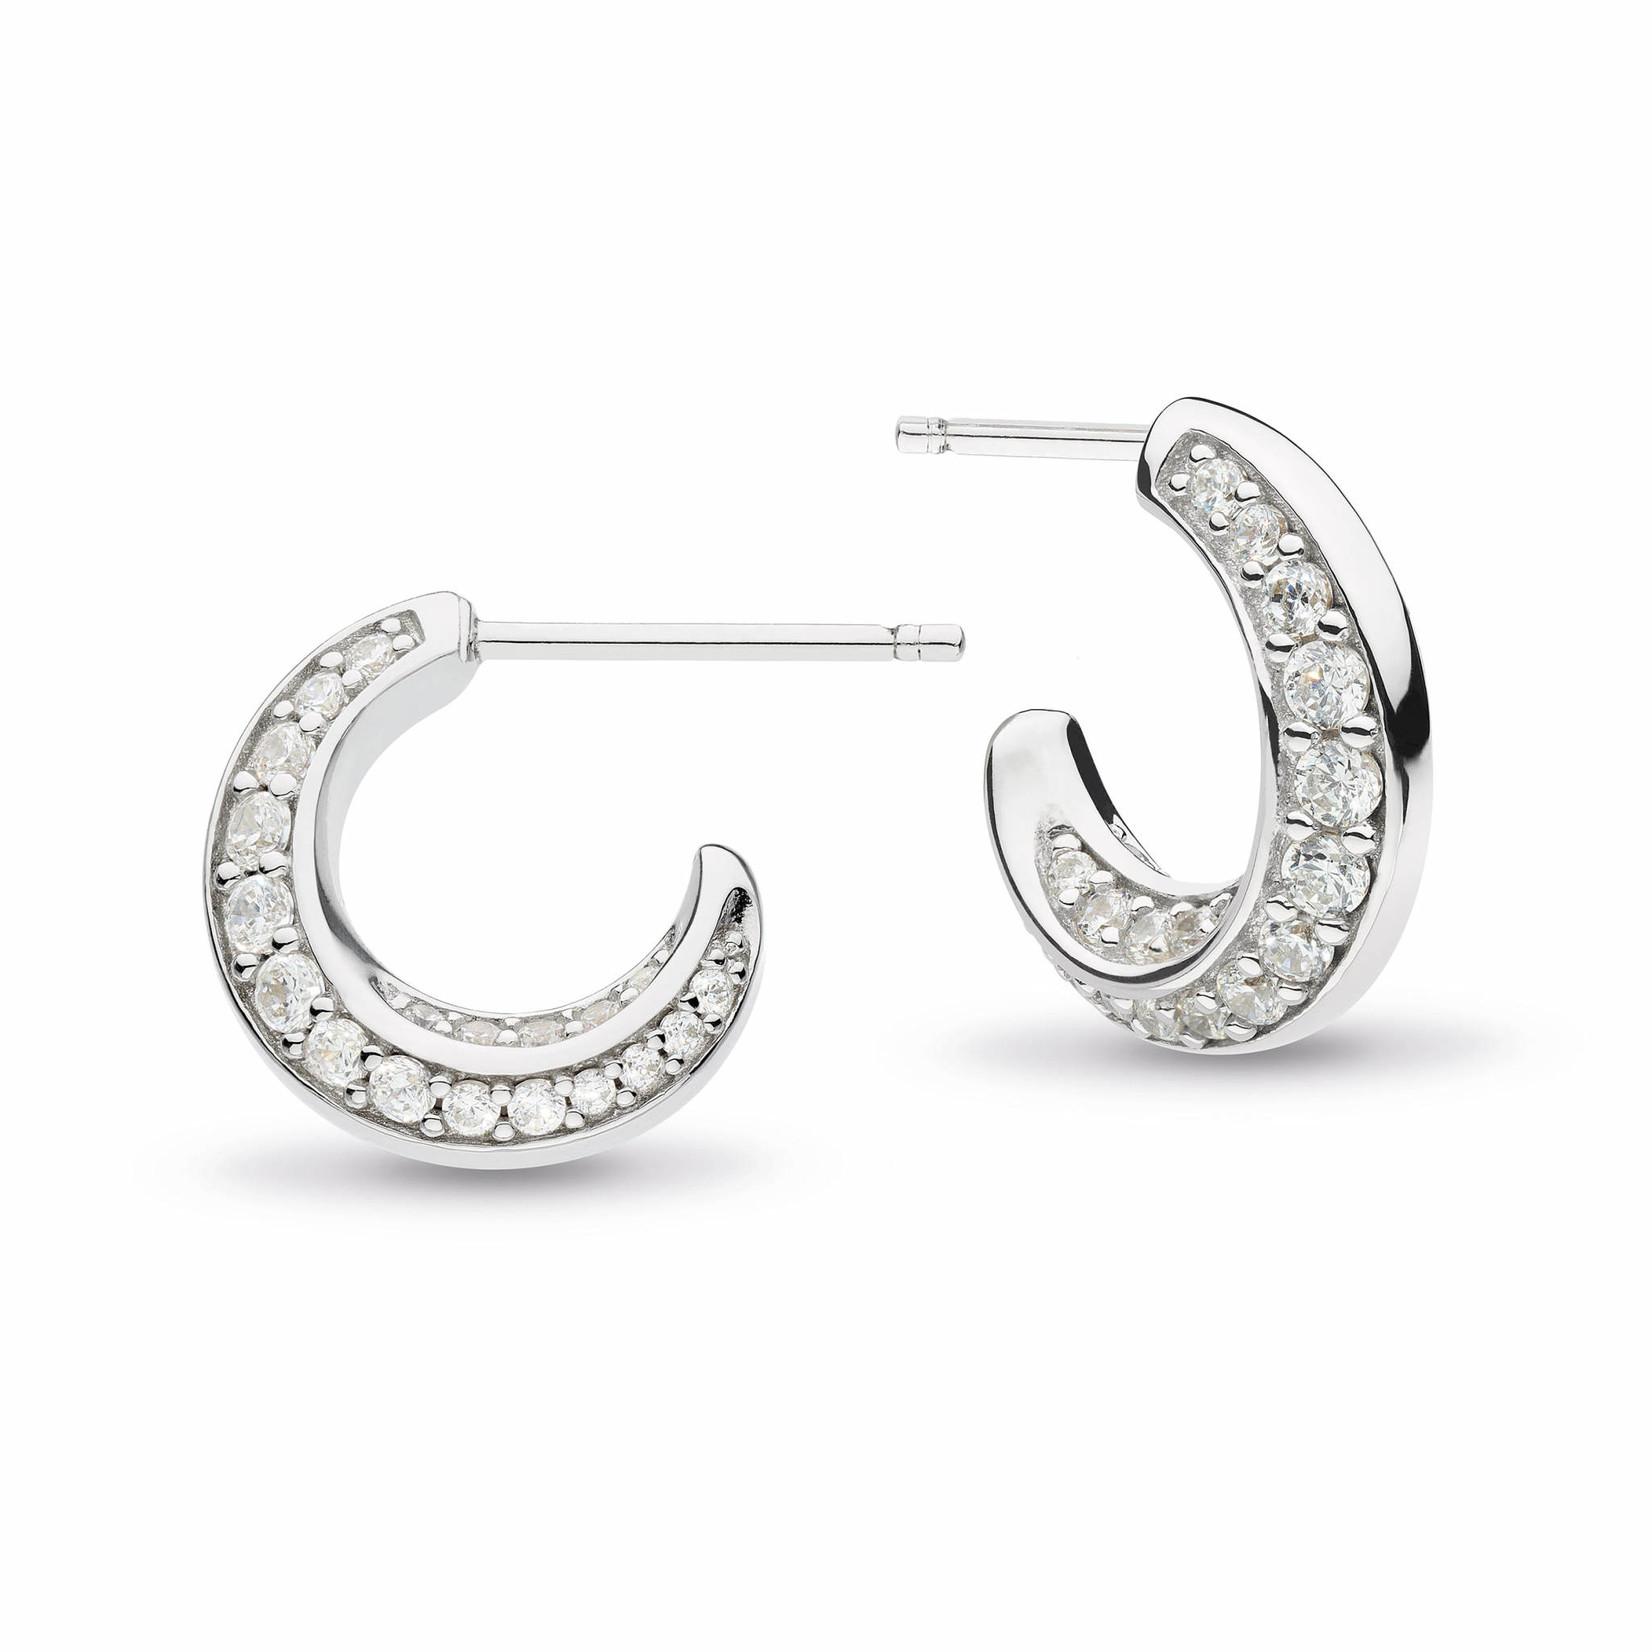 Bevel Cirque CZ Pavé RP Semi-Hoop Stud Earrings